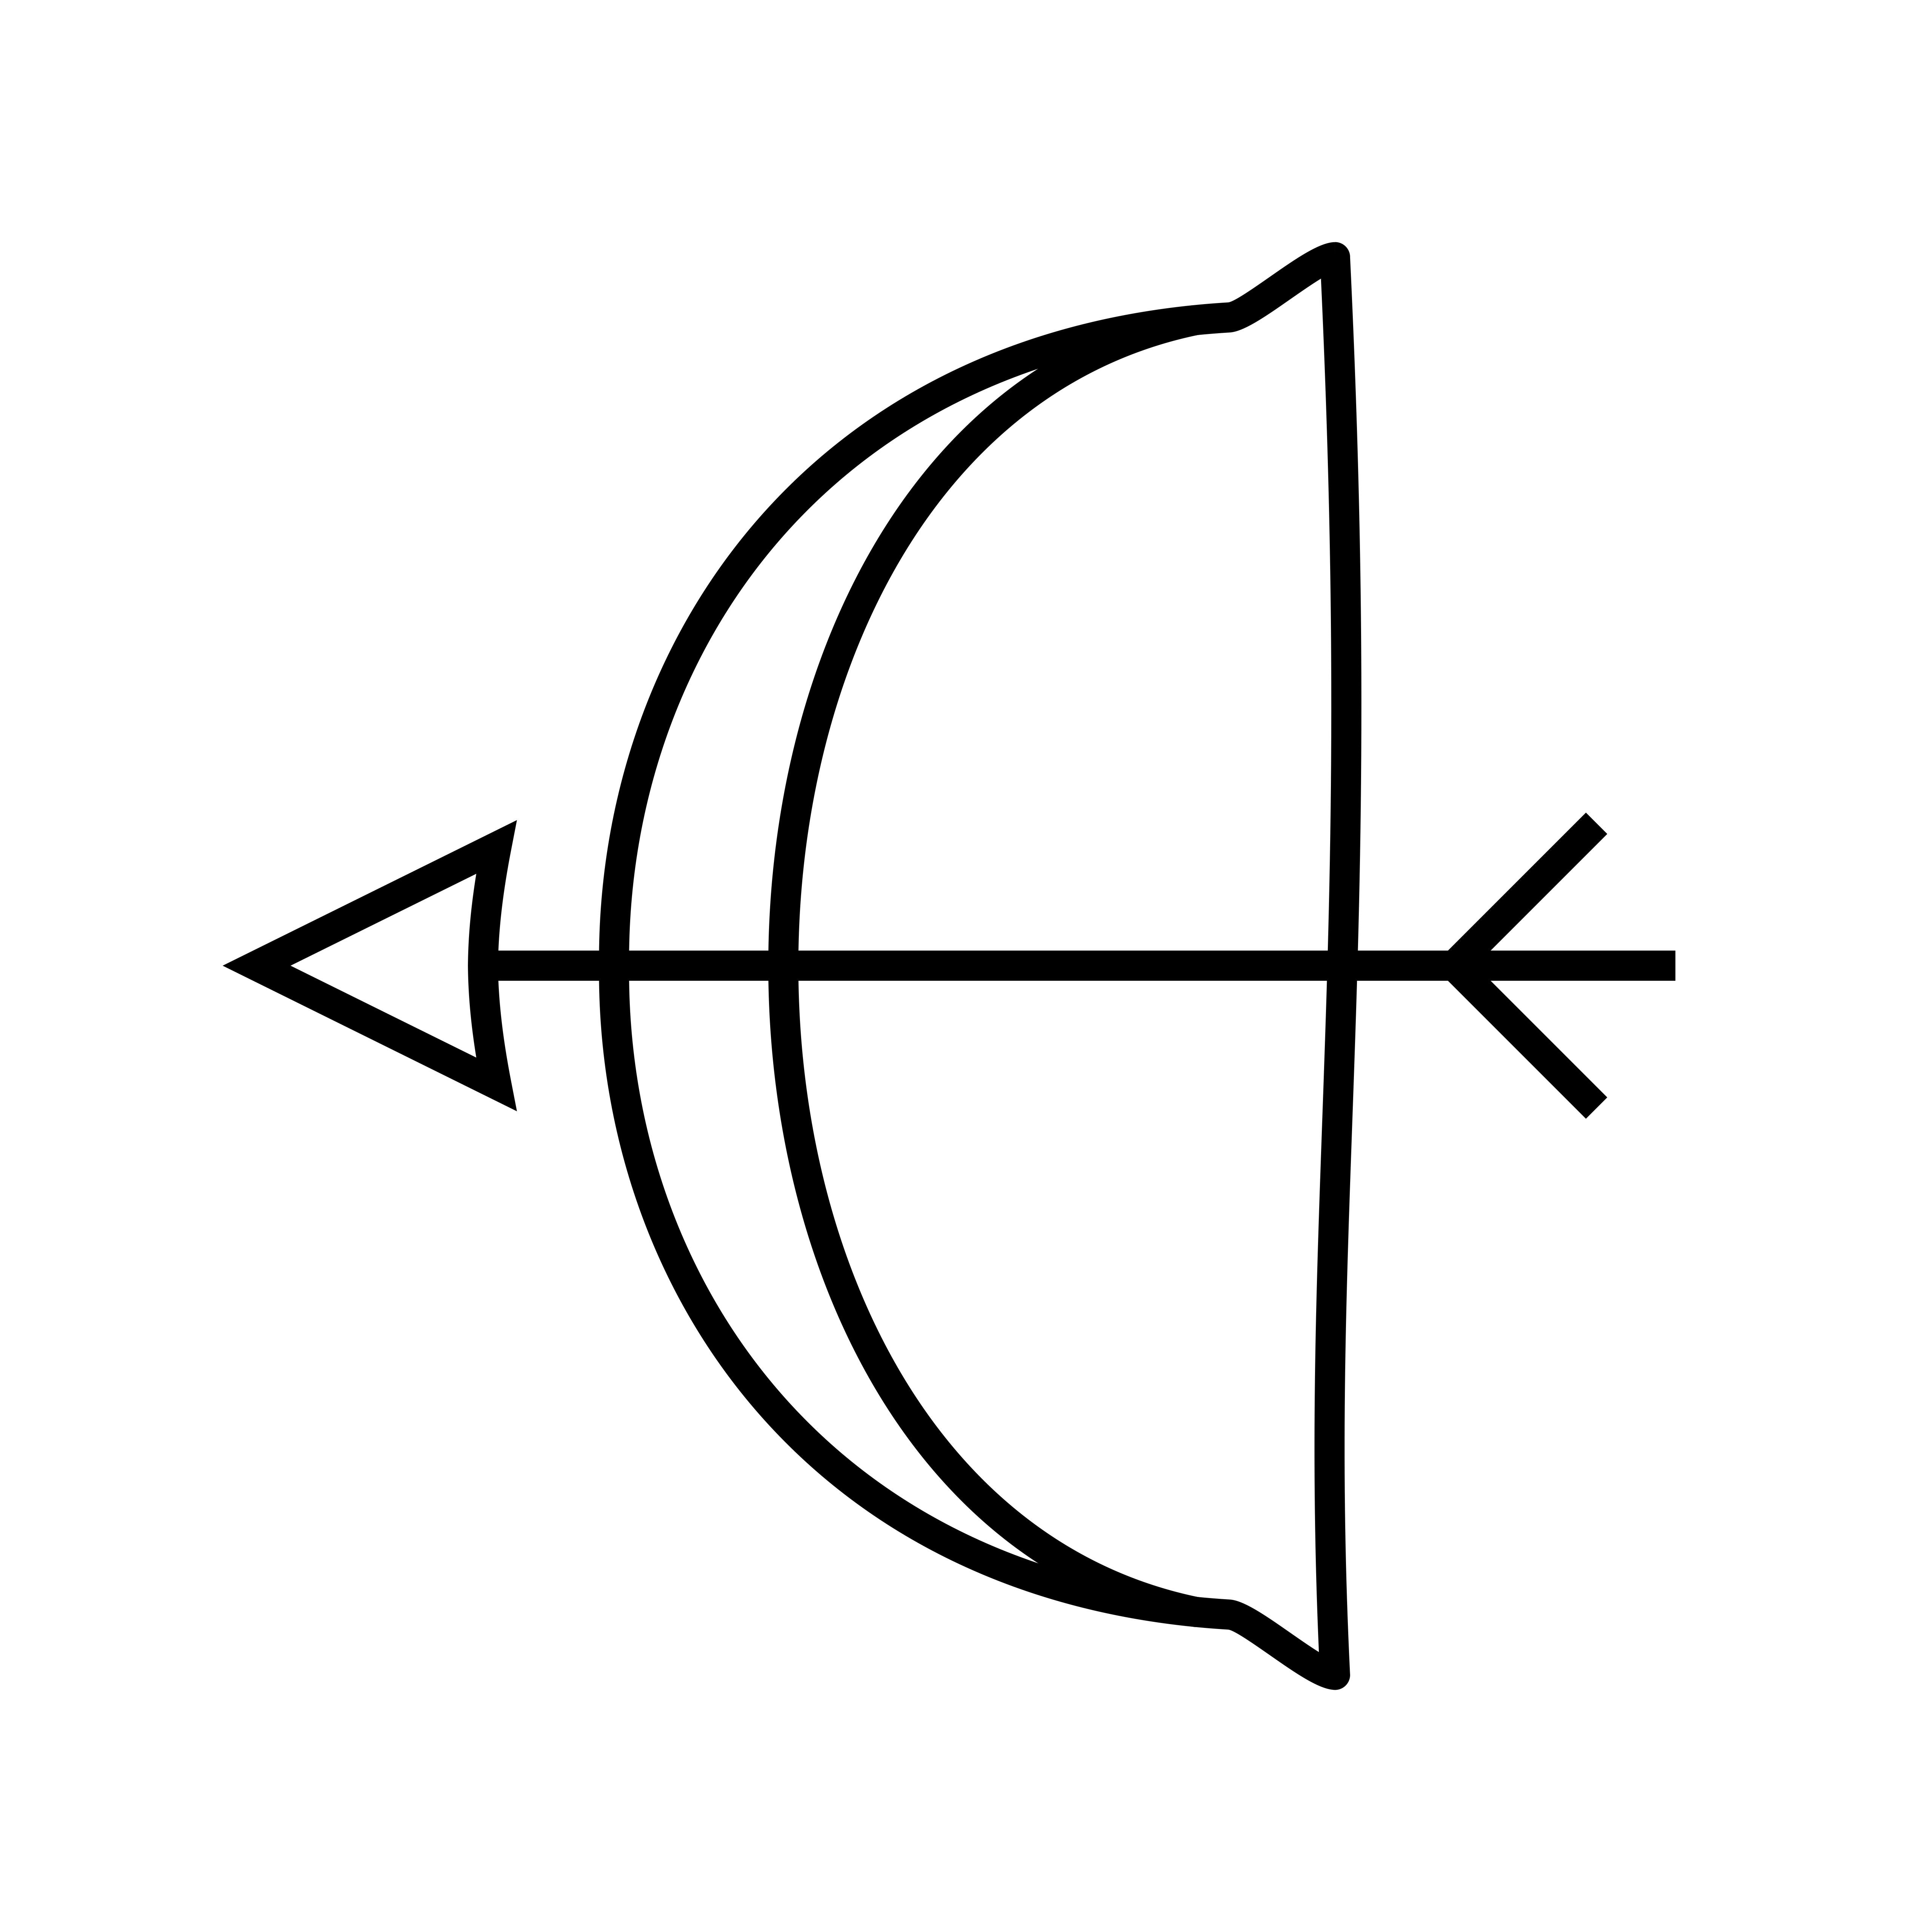 Archery Line Black Icon